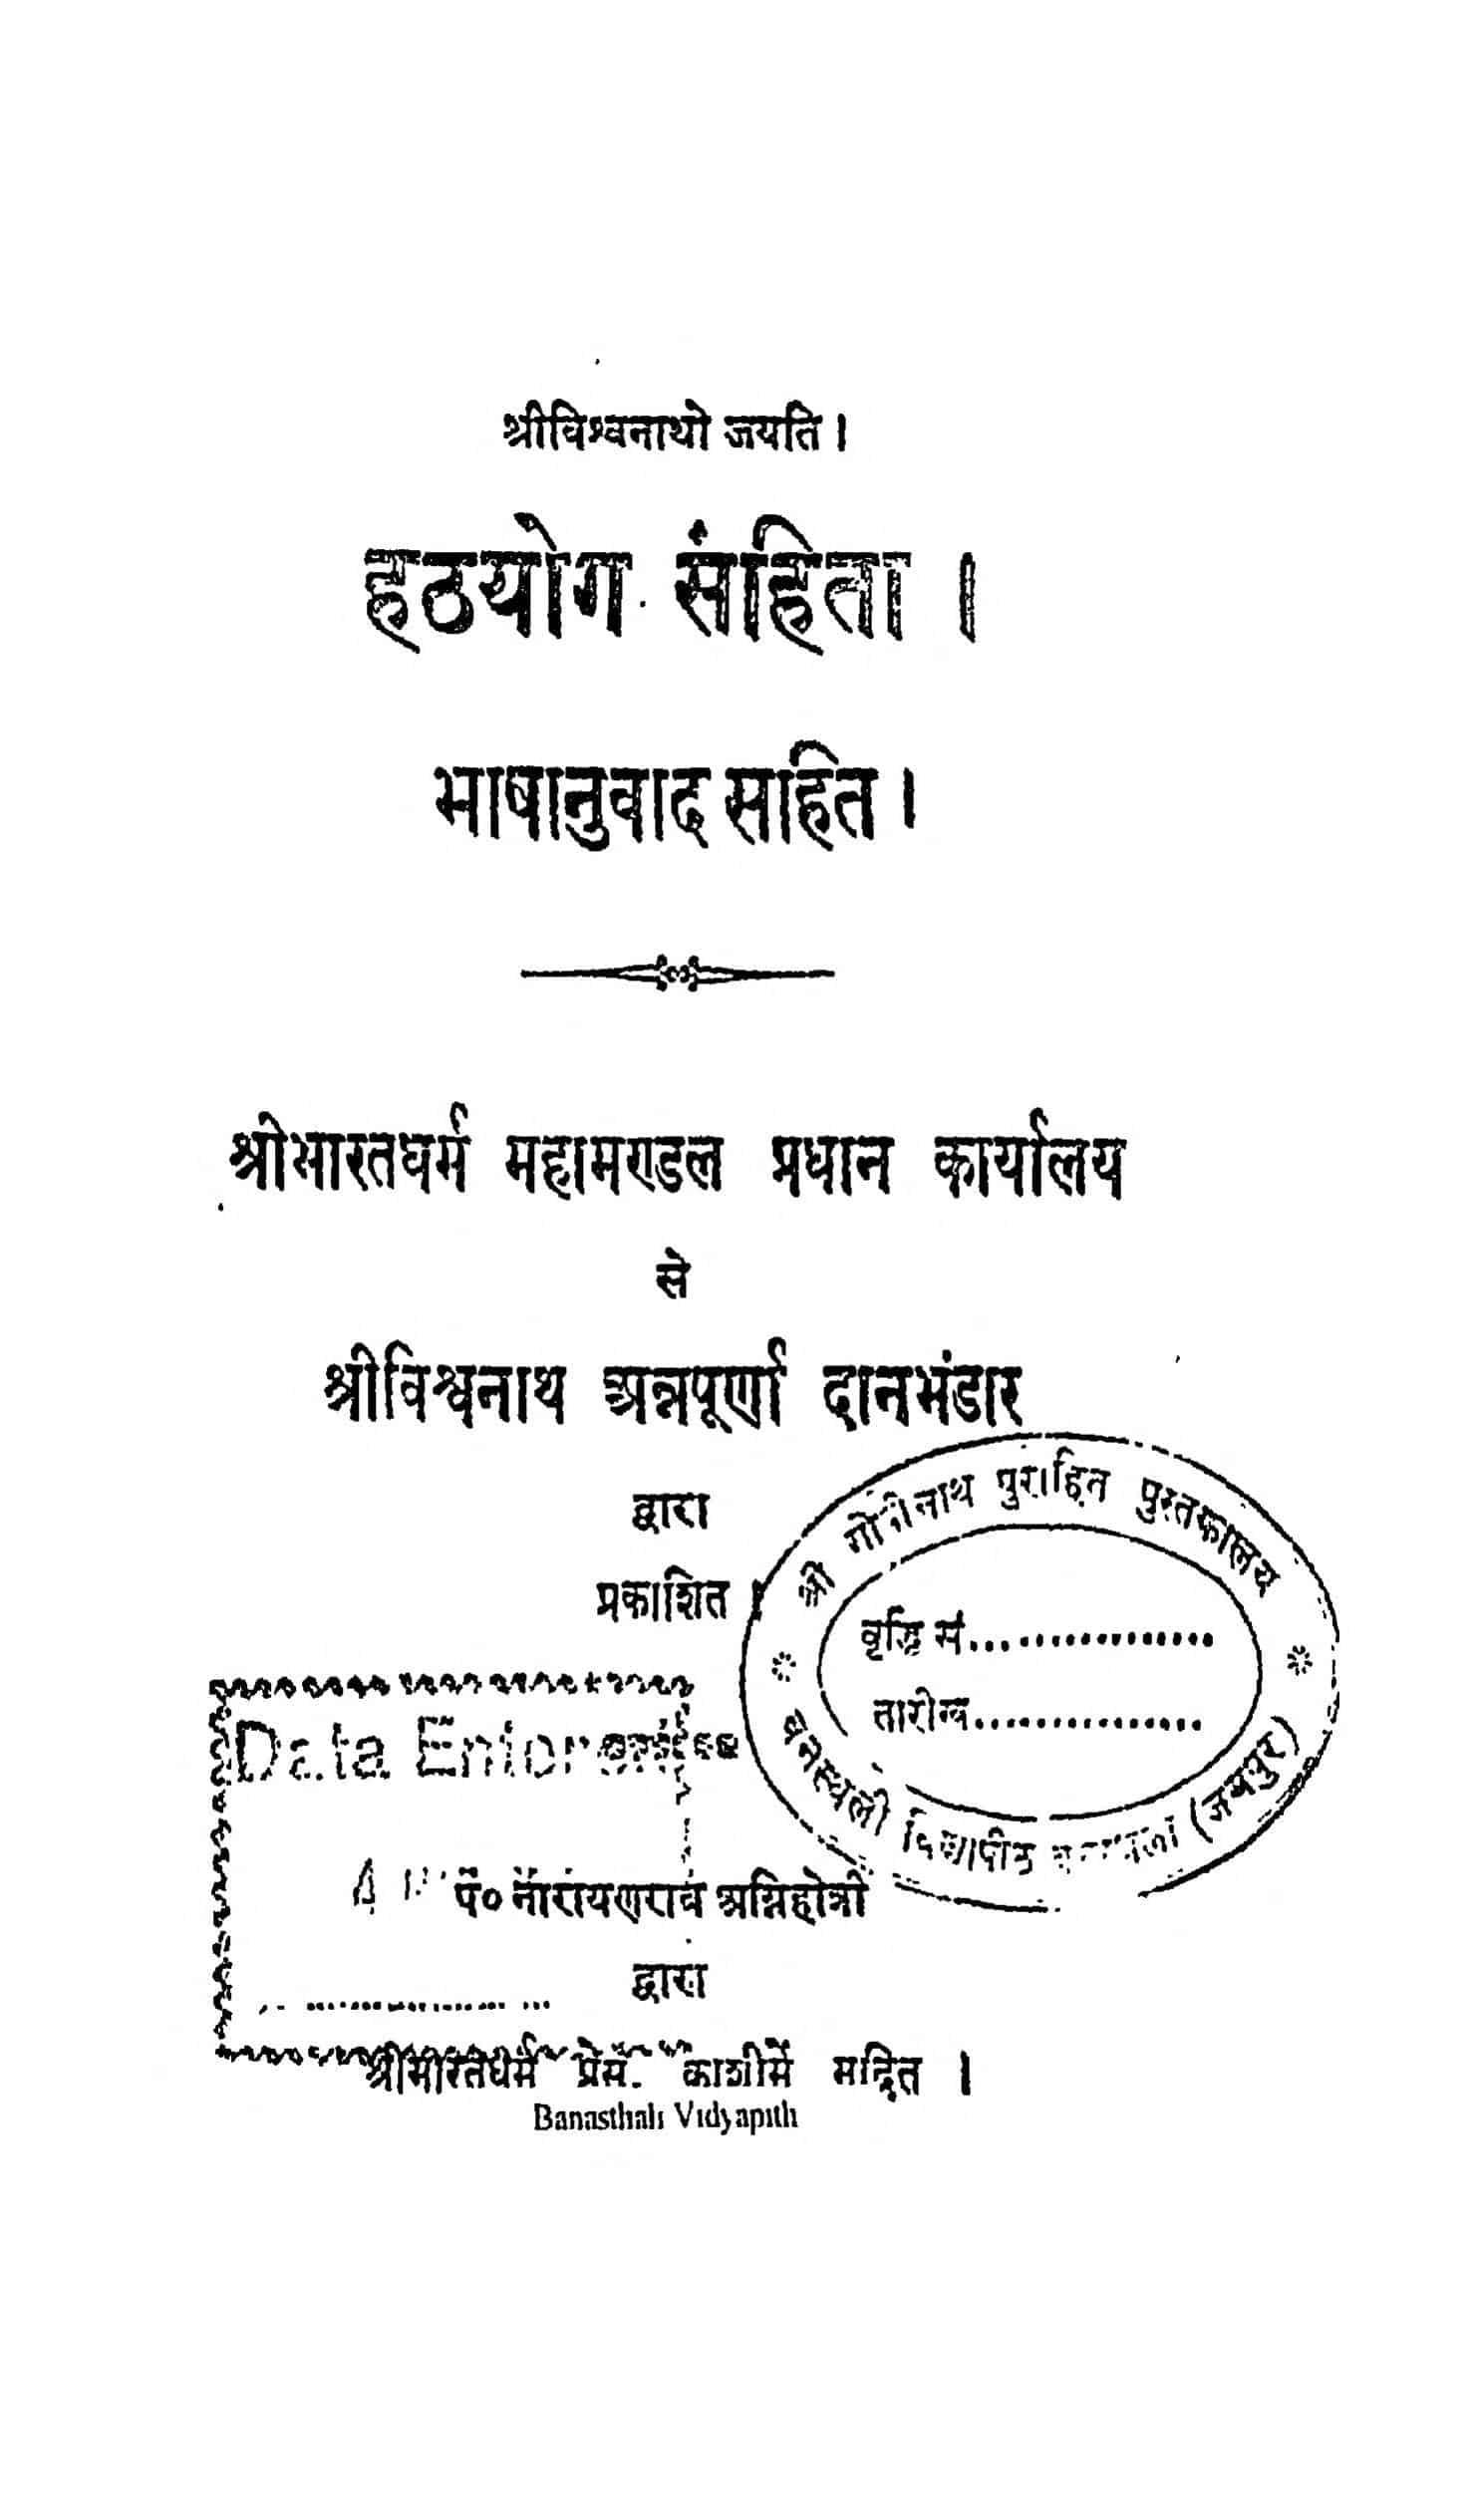 Book Image : हठयोग संहिता - Hathyog Sanhita